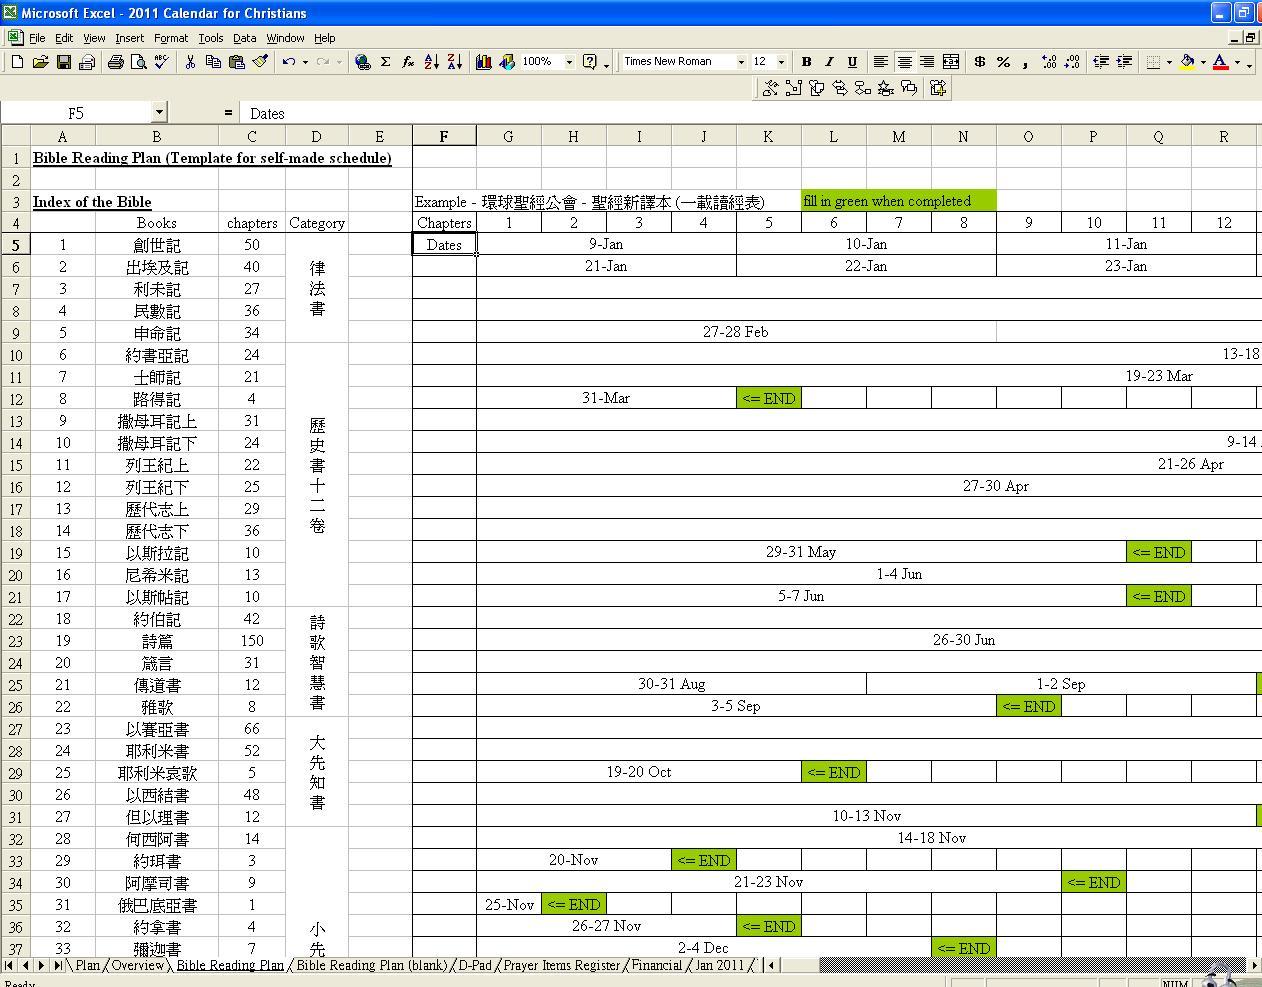 Bible reading plan excel spreadsheet